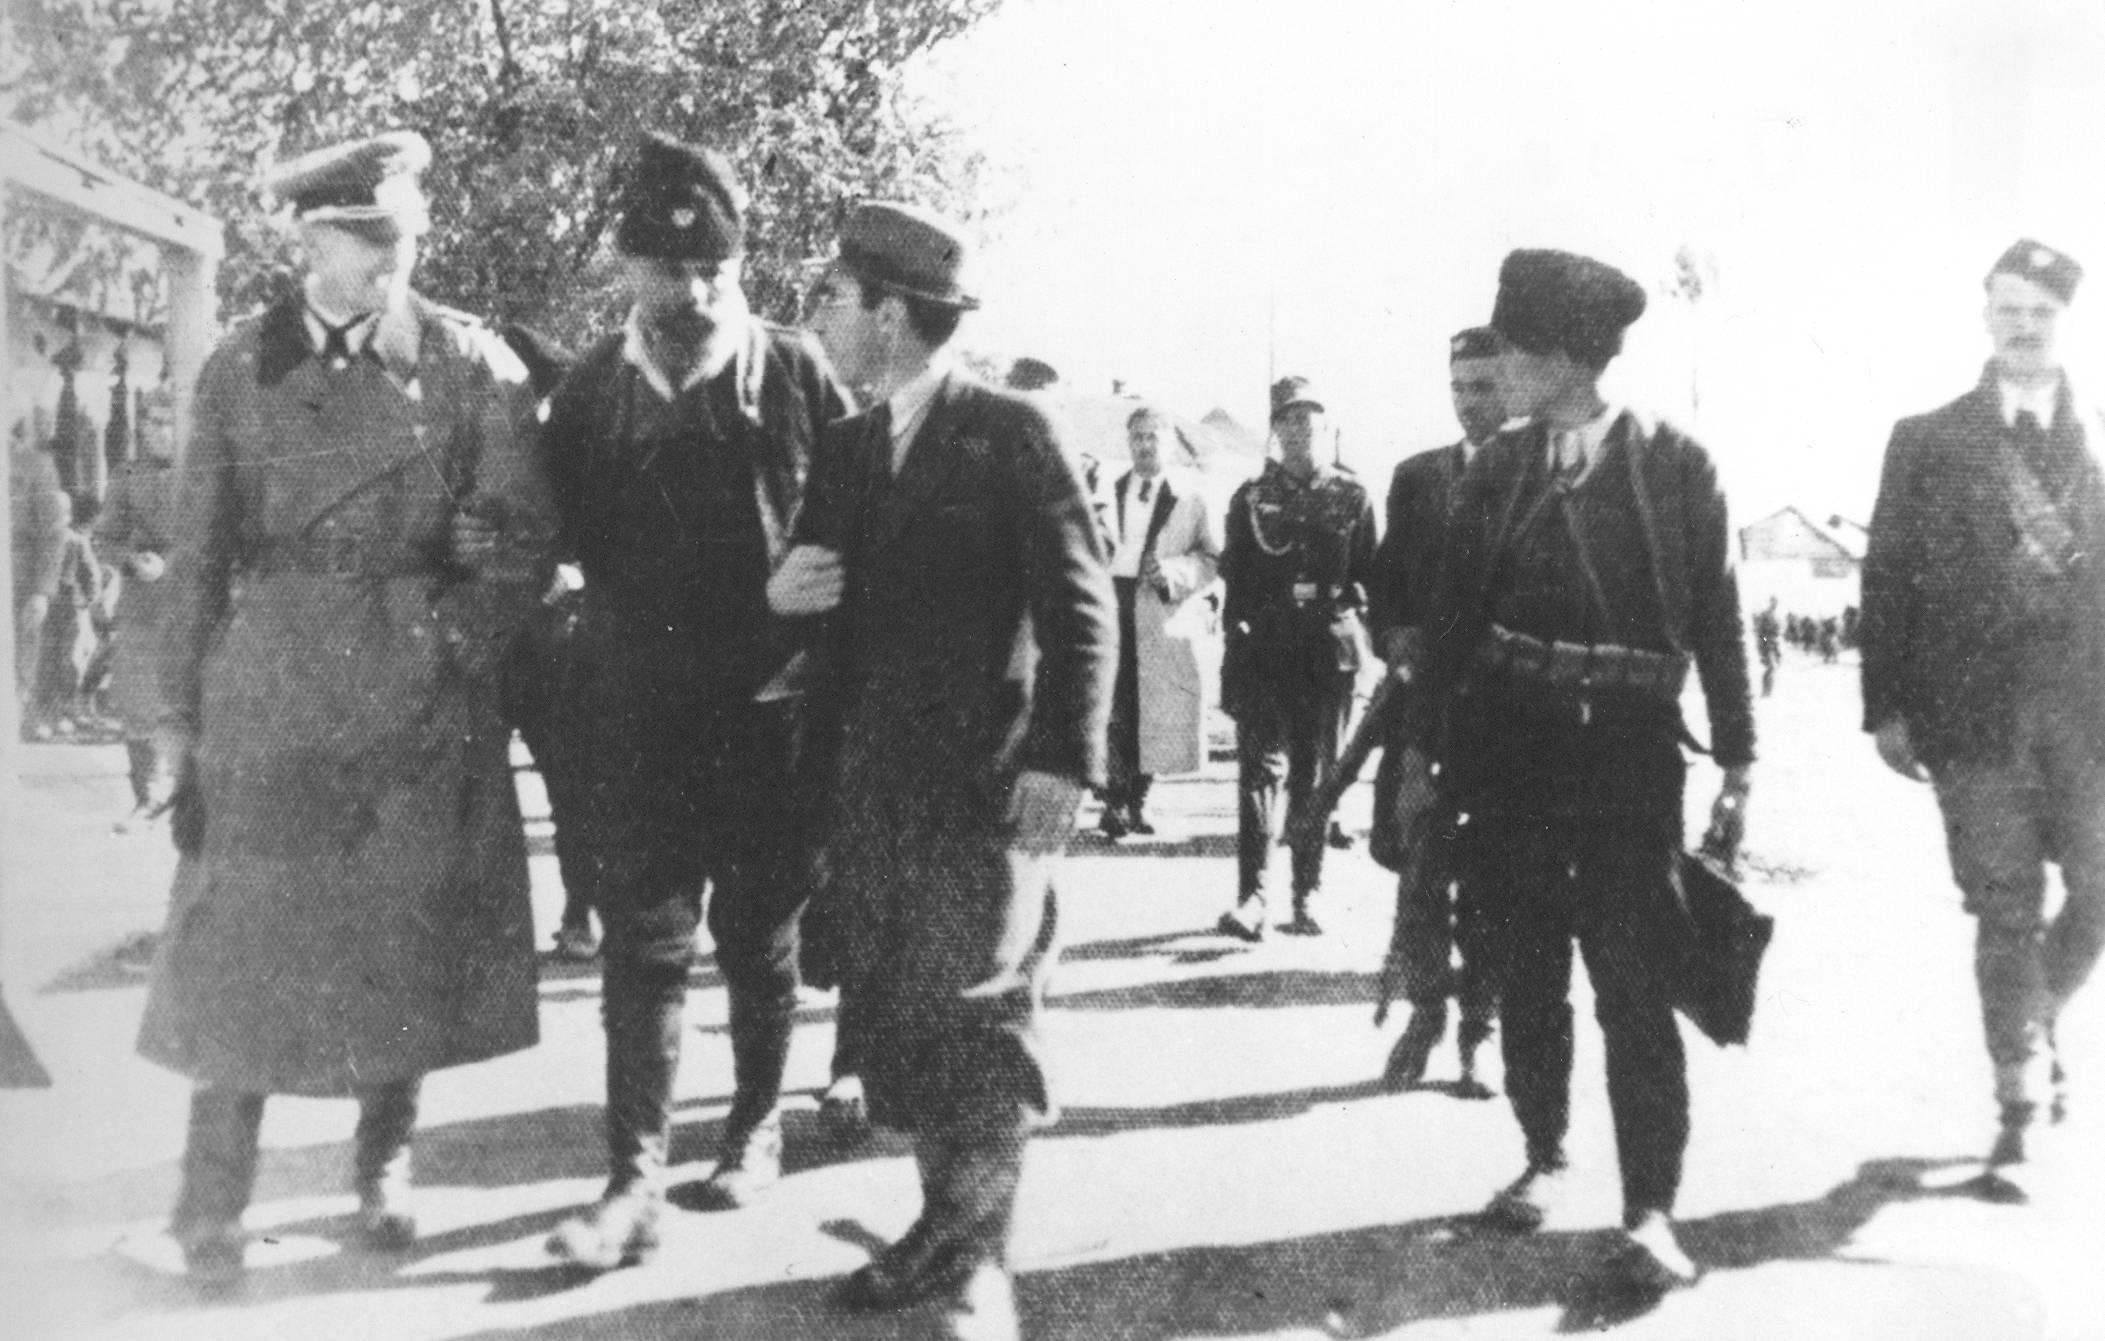 Pecanac and Germans